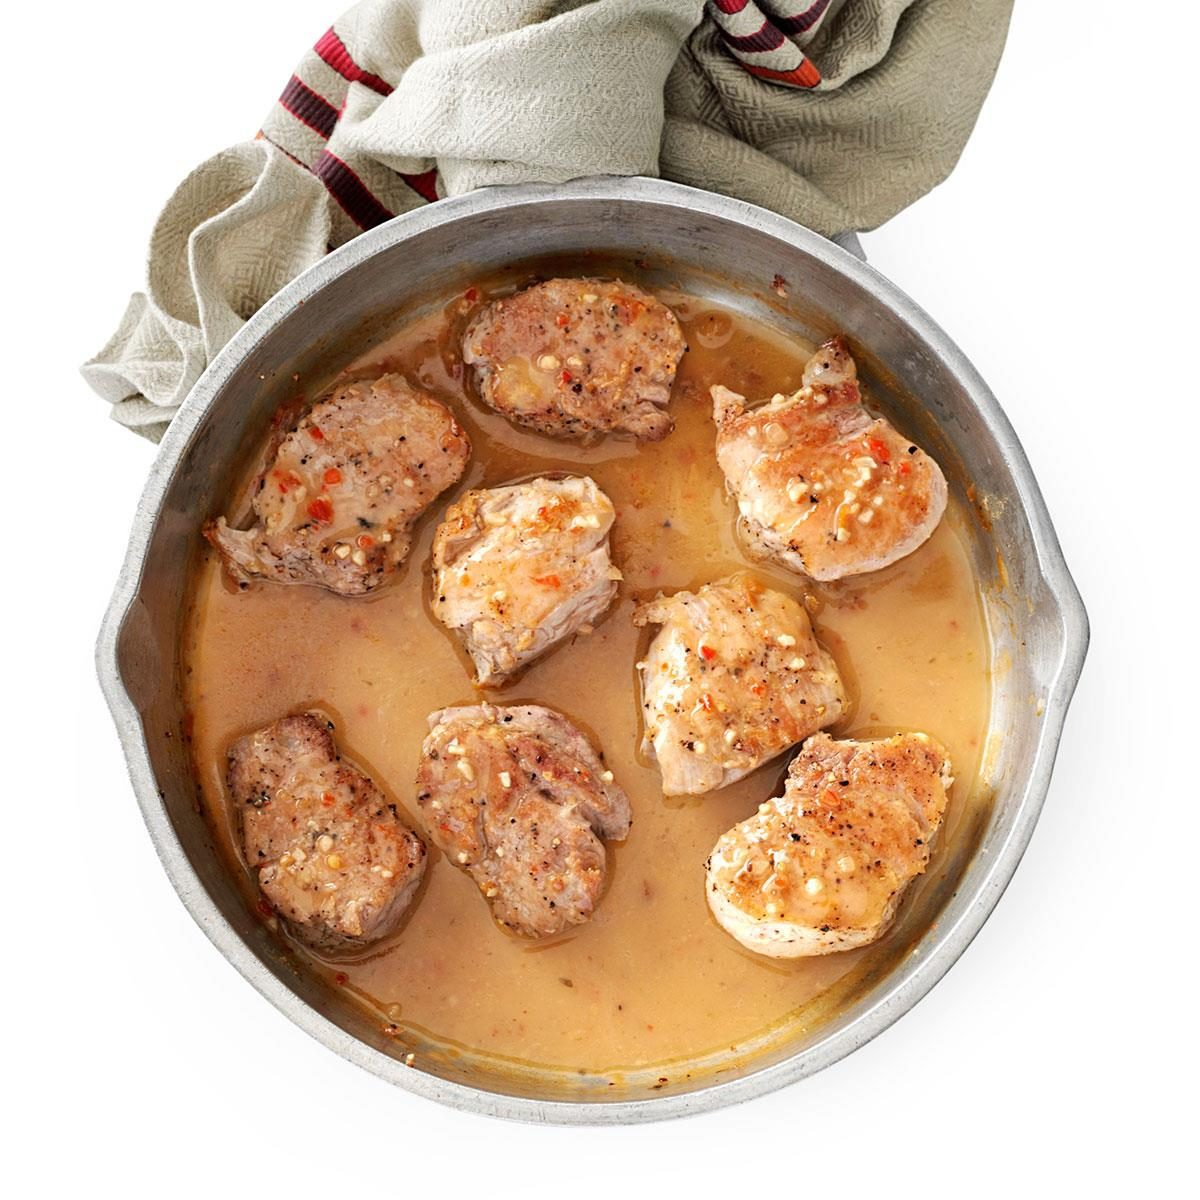 Pork Tenderloin Recipes: Pork Tenderloin With Zesty Italian Sauce Recipe